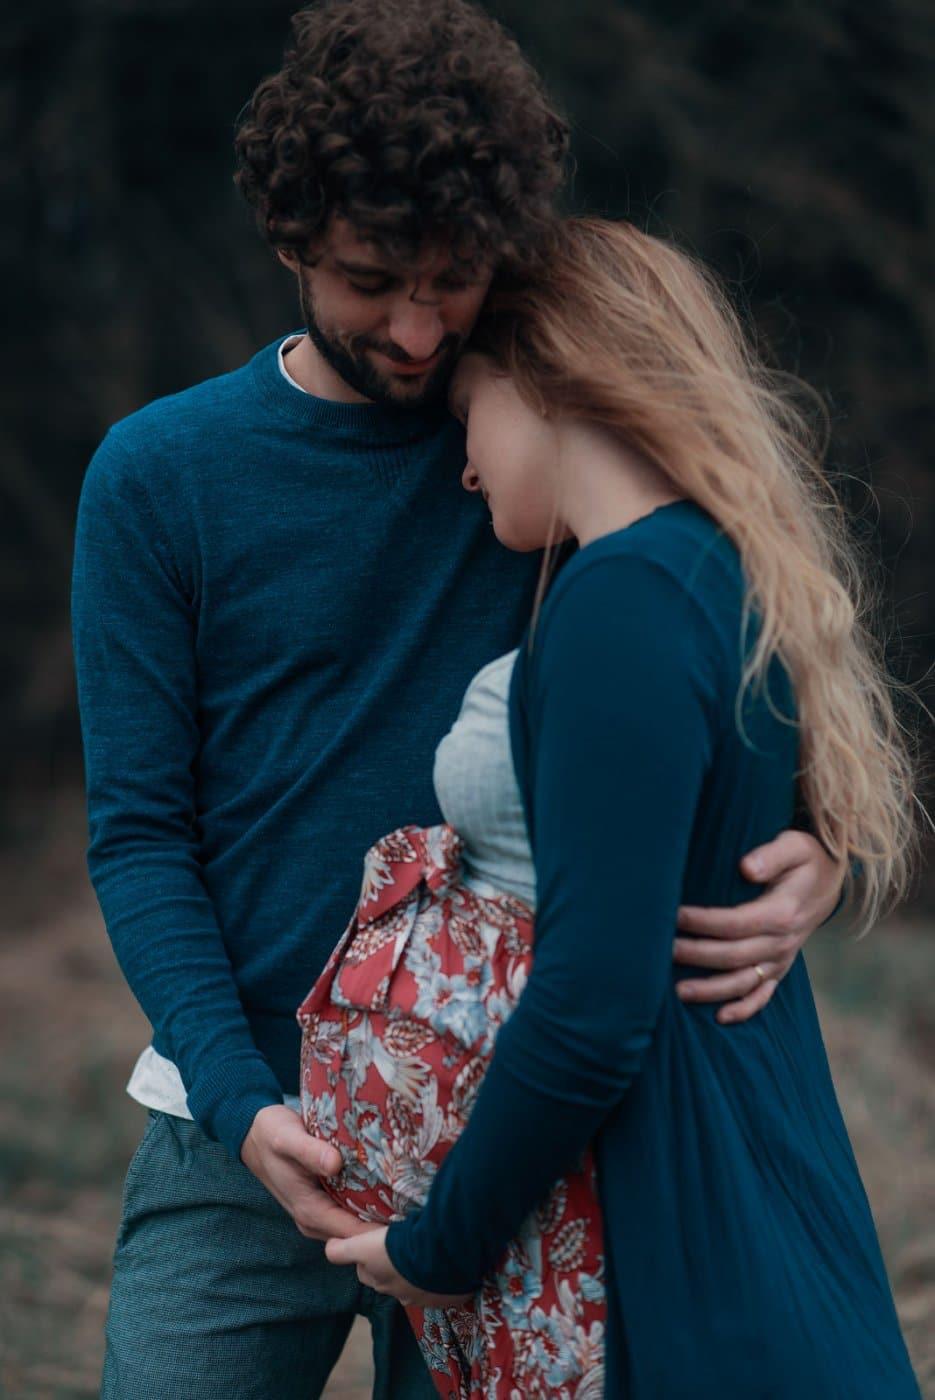 Pregnancy Photography By Anastasia Vervueren Couple Grossesse